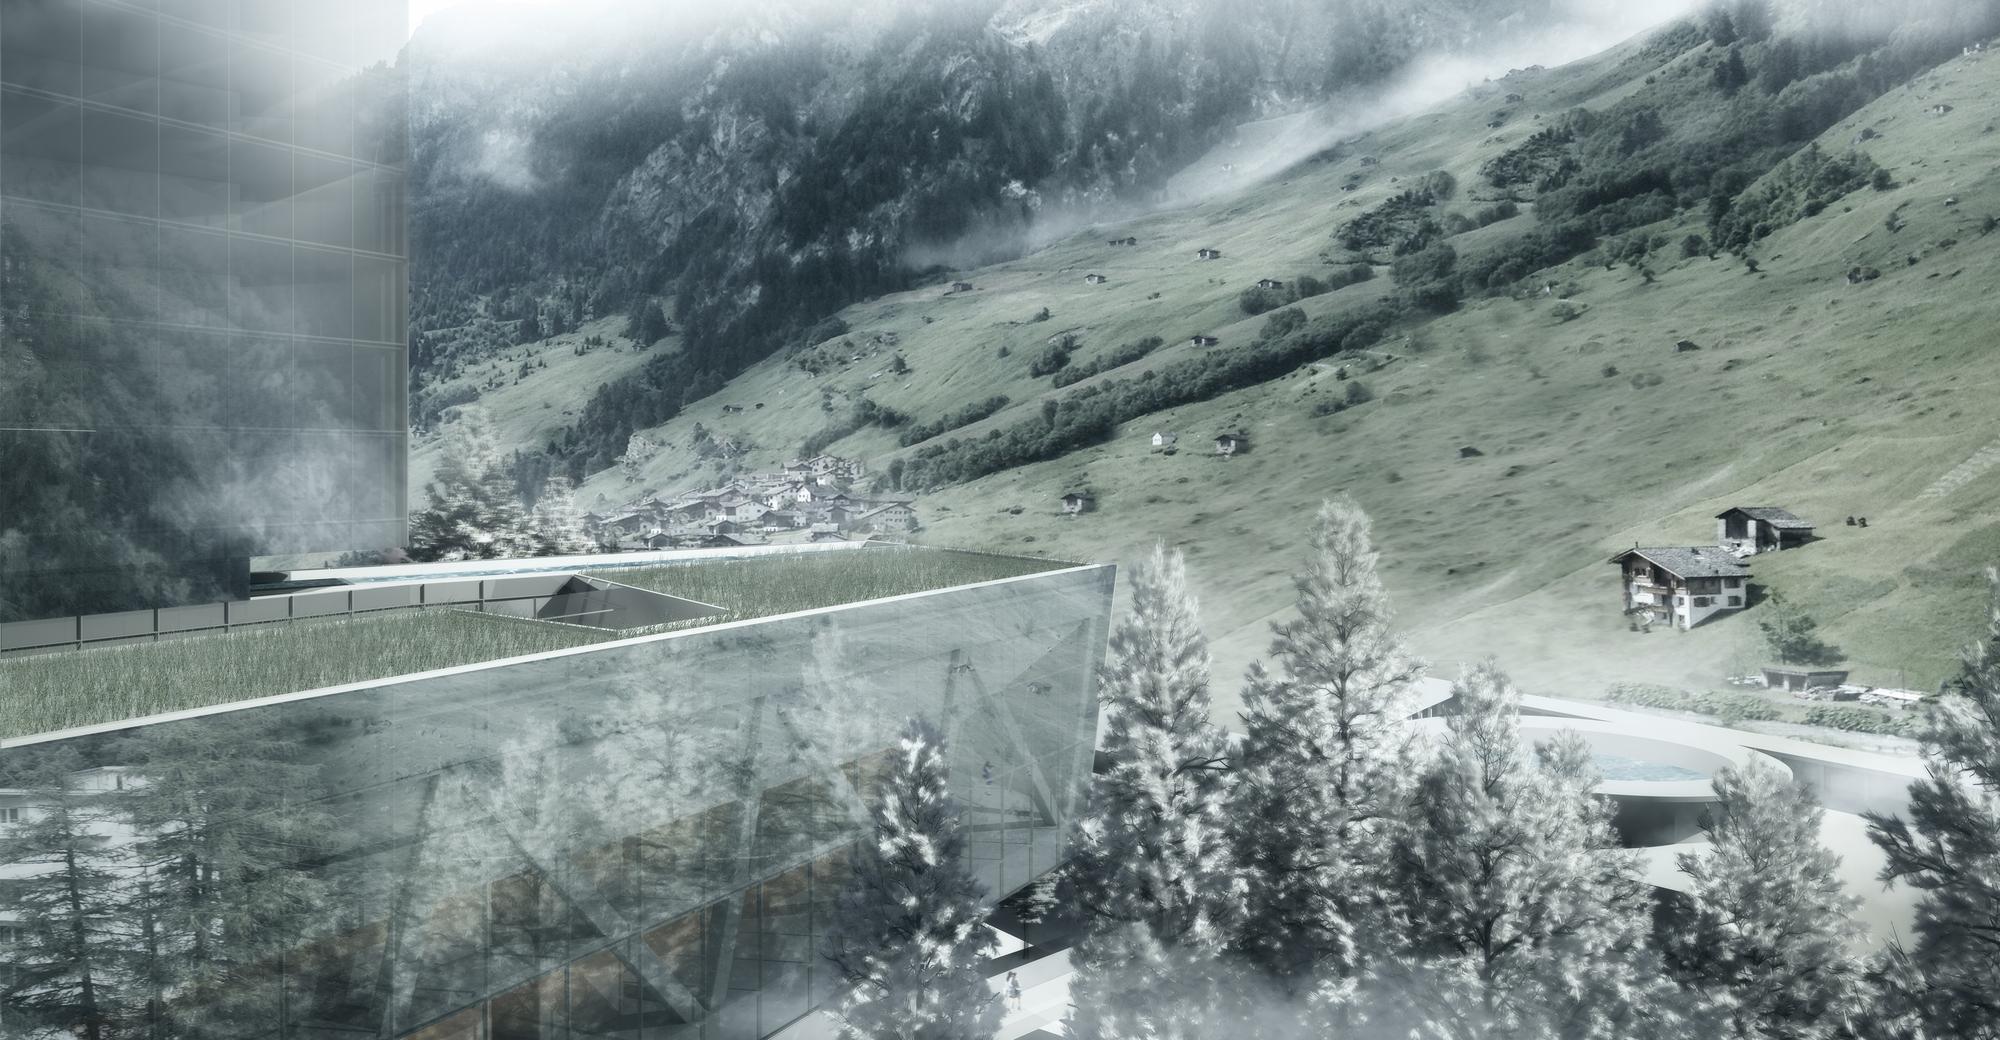 Swiss Alps - Vals tallest building Europe